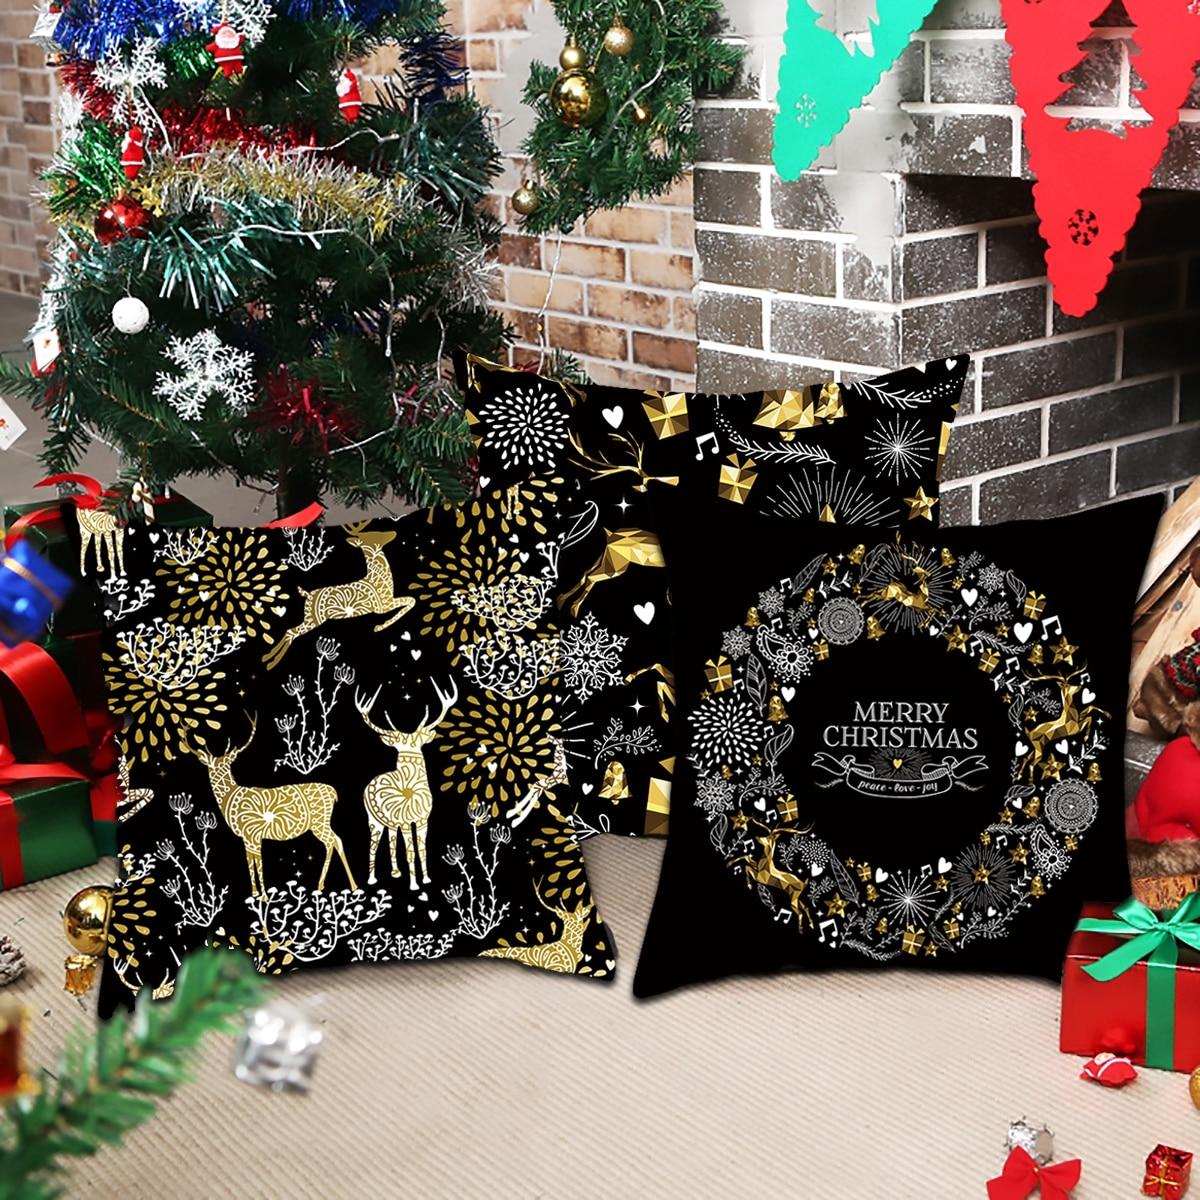 H8e13605eaf8b40bd933e96d17ea37a04f Christmas Pillow Coussin Cartoon Geometric Cushions Case Christmas Home Decorative Cushion For Sofa Xmas DIY Soft hug Pillowcase